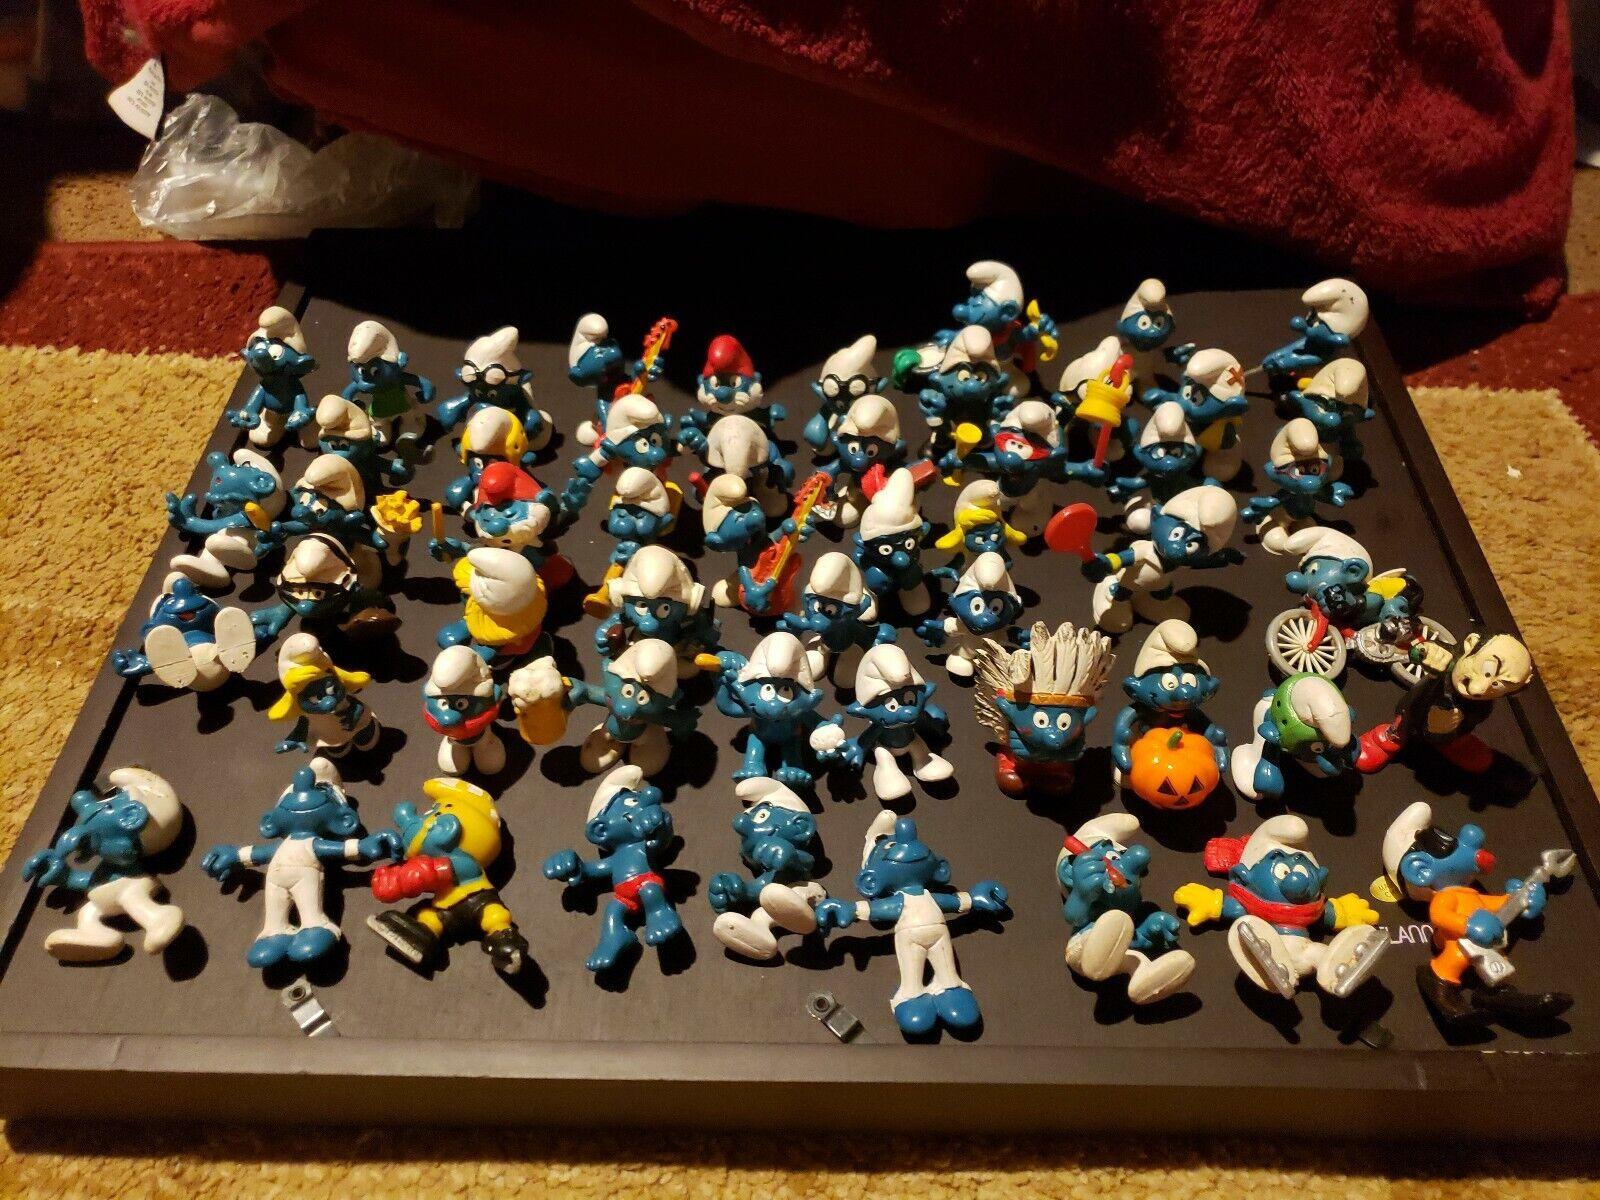 Lot av 54 årgång Smurfer 1980 -talet PVC 2 65533;'Dråp 65533; Figures Schleich Peyo leksaker m.m.